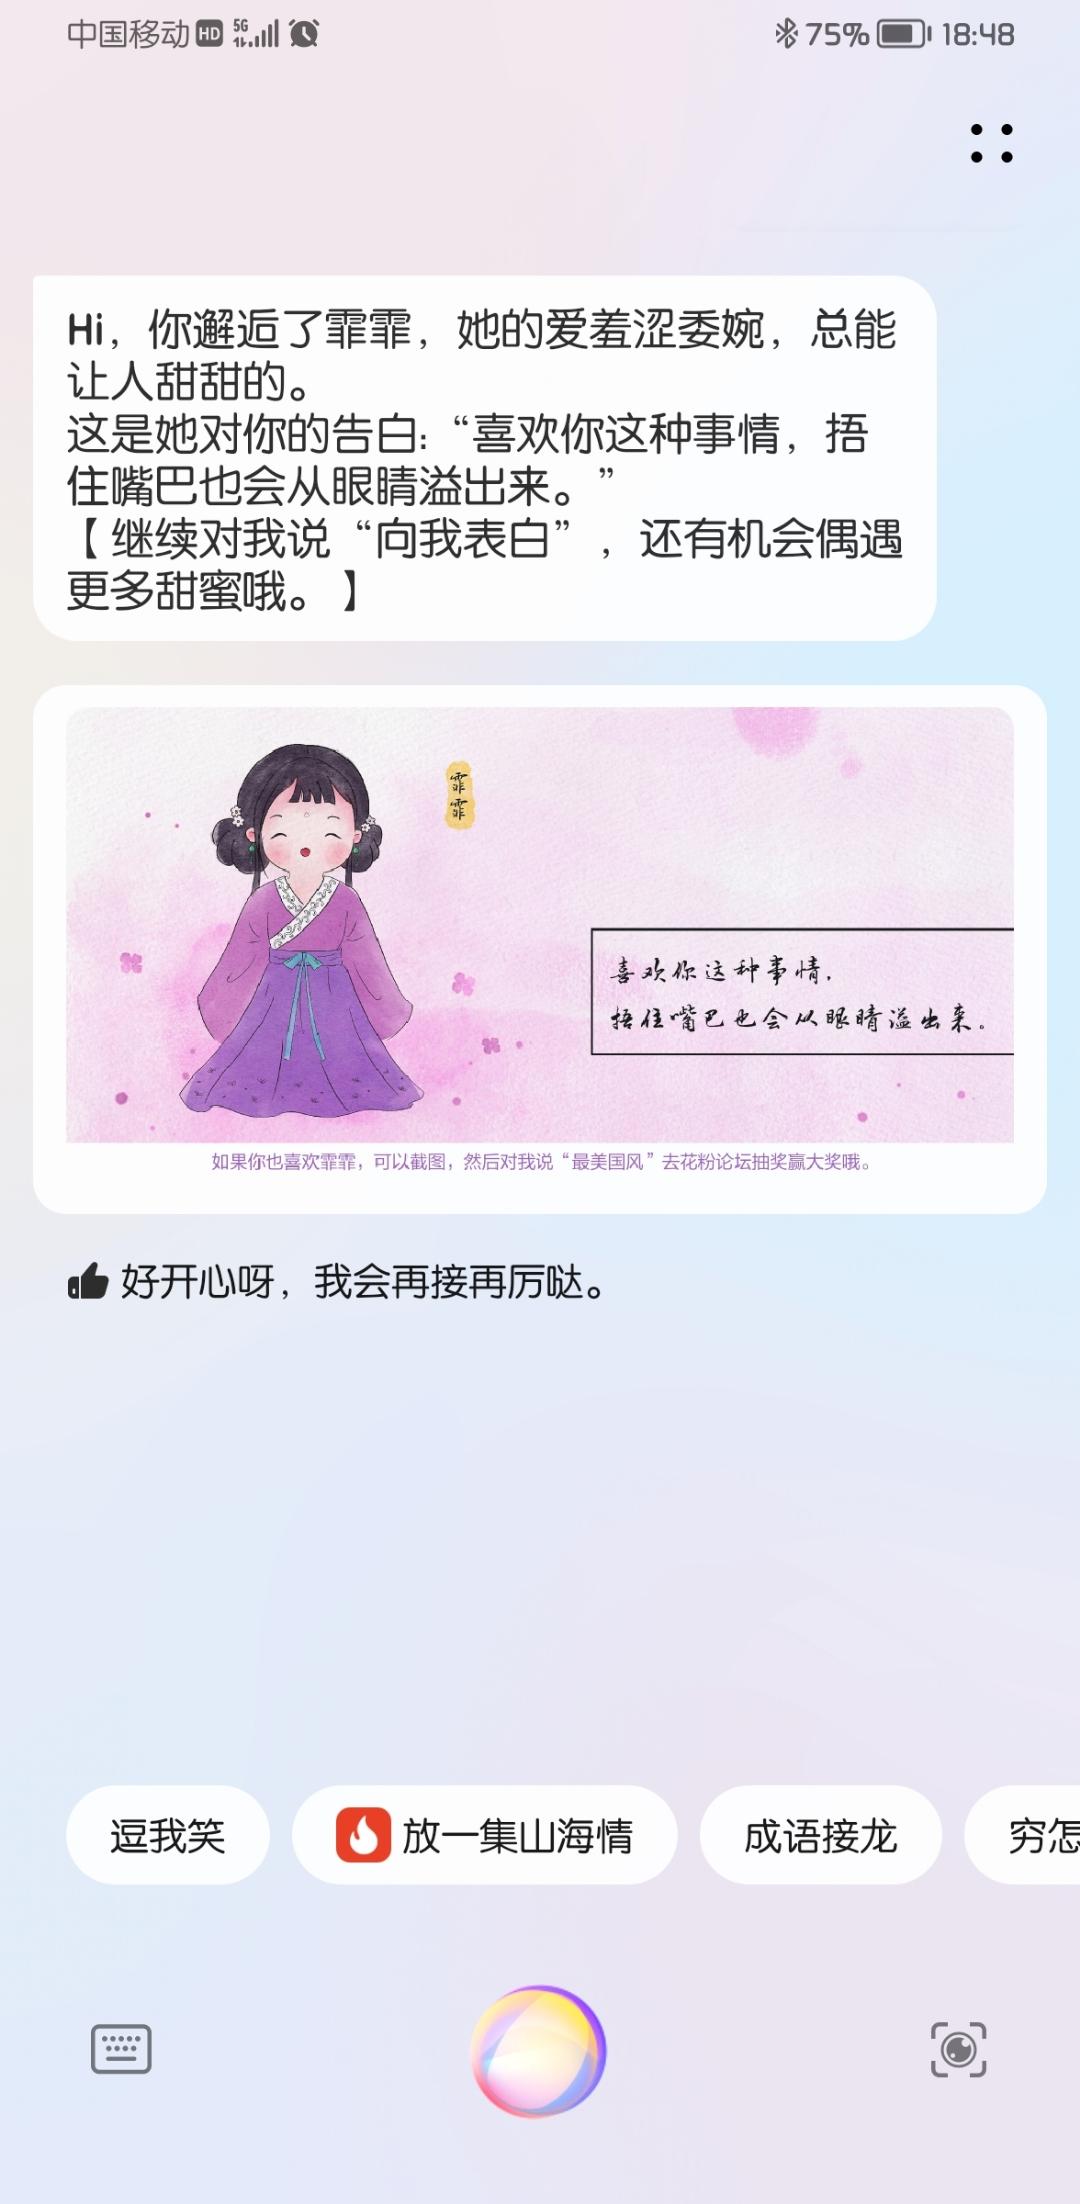 Screenshot_20210611_184817_com.huawei.vassistant.jpg